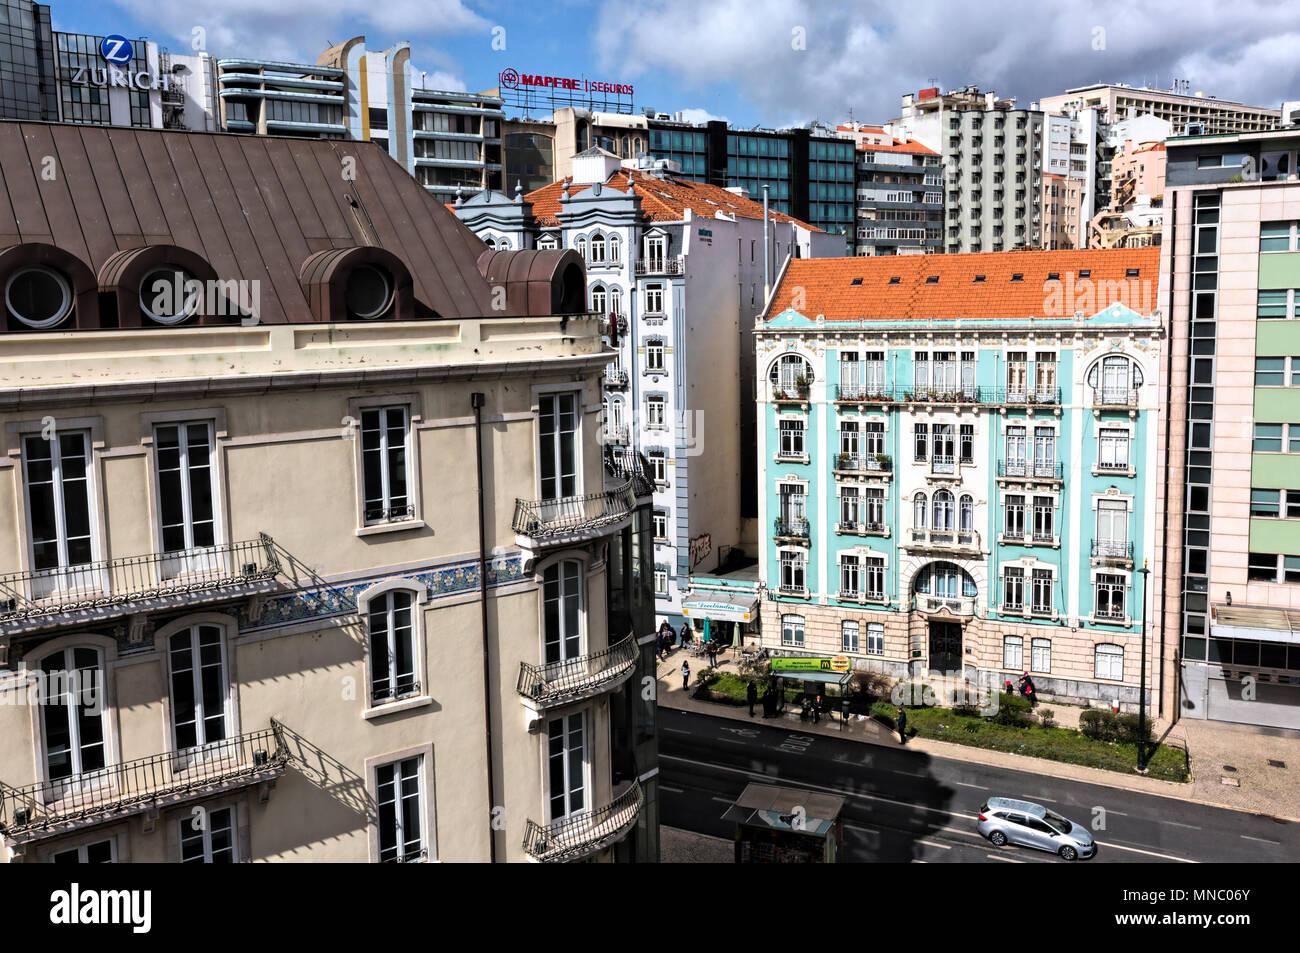 View from Hotel PortoBay Marquês across Rua Braamcamp - Stock Image